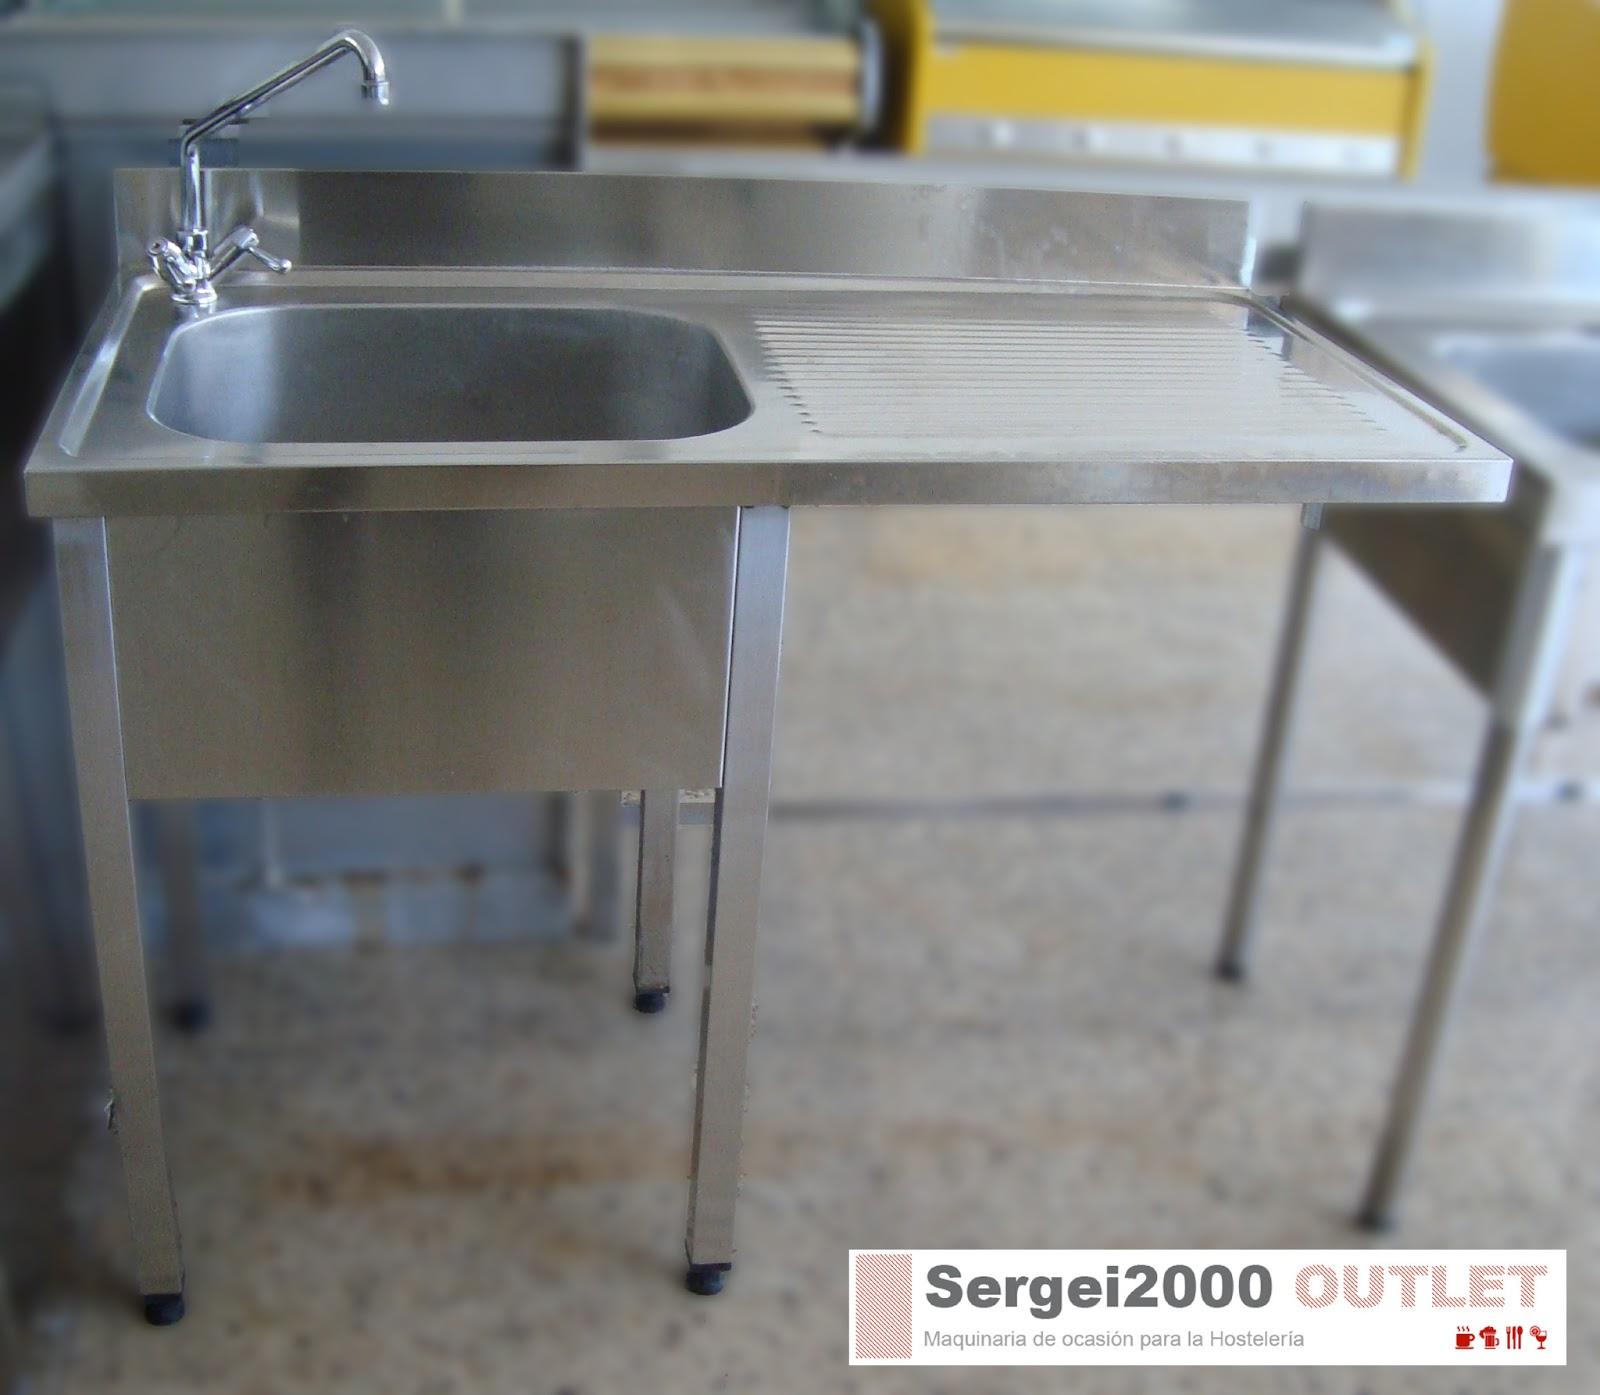 Pumps tubos termo boiler fregadero 1 seno escurridor - Pica lavabo leroy merlin ...